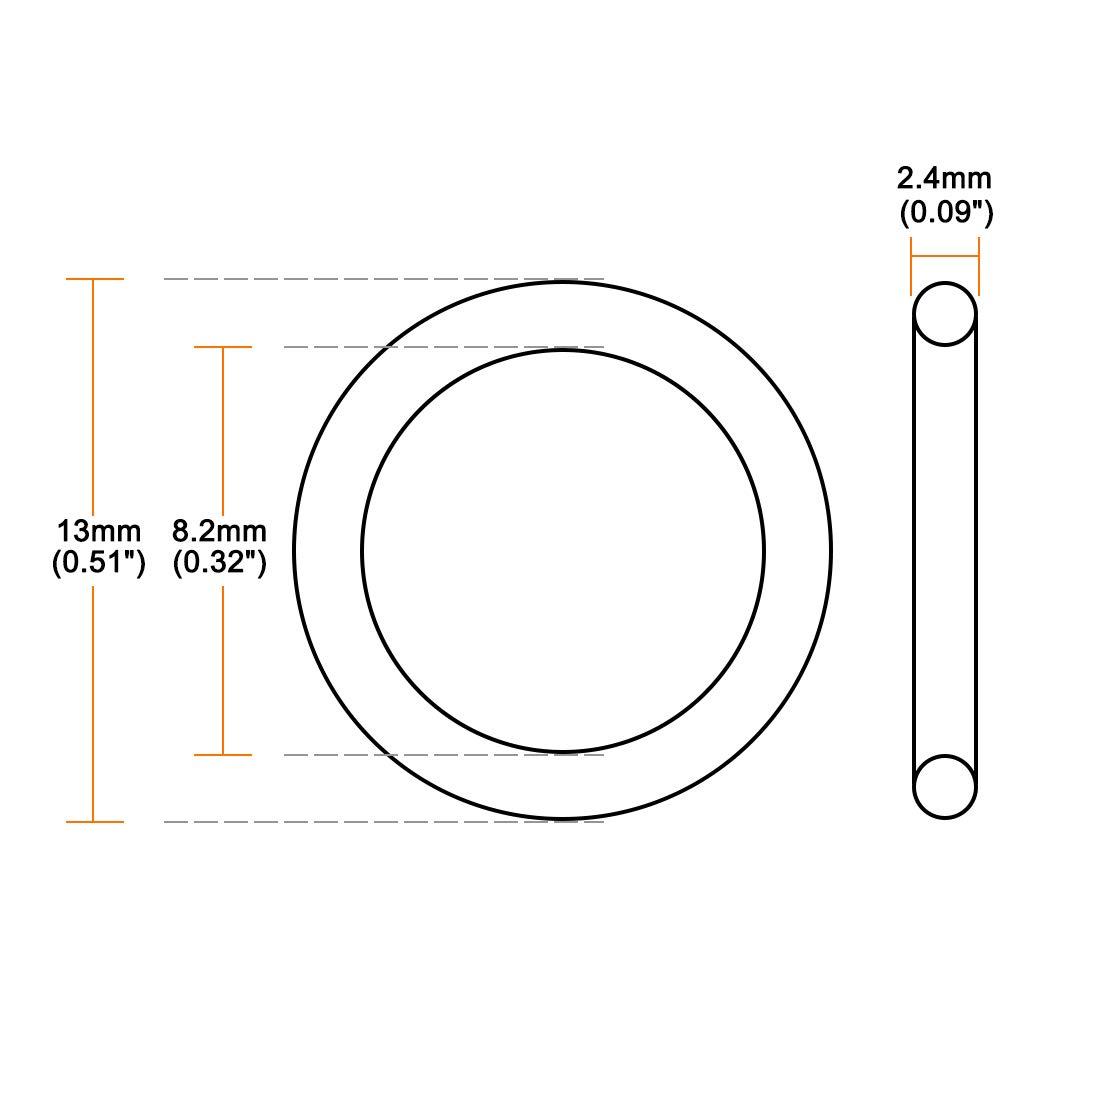 8,2mm Innendurchmesser 2,4mm Breite Dichtung Wei/ß sourcing map 30Stk Silikon O-Ringe 13mm OD